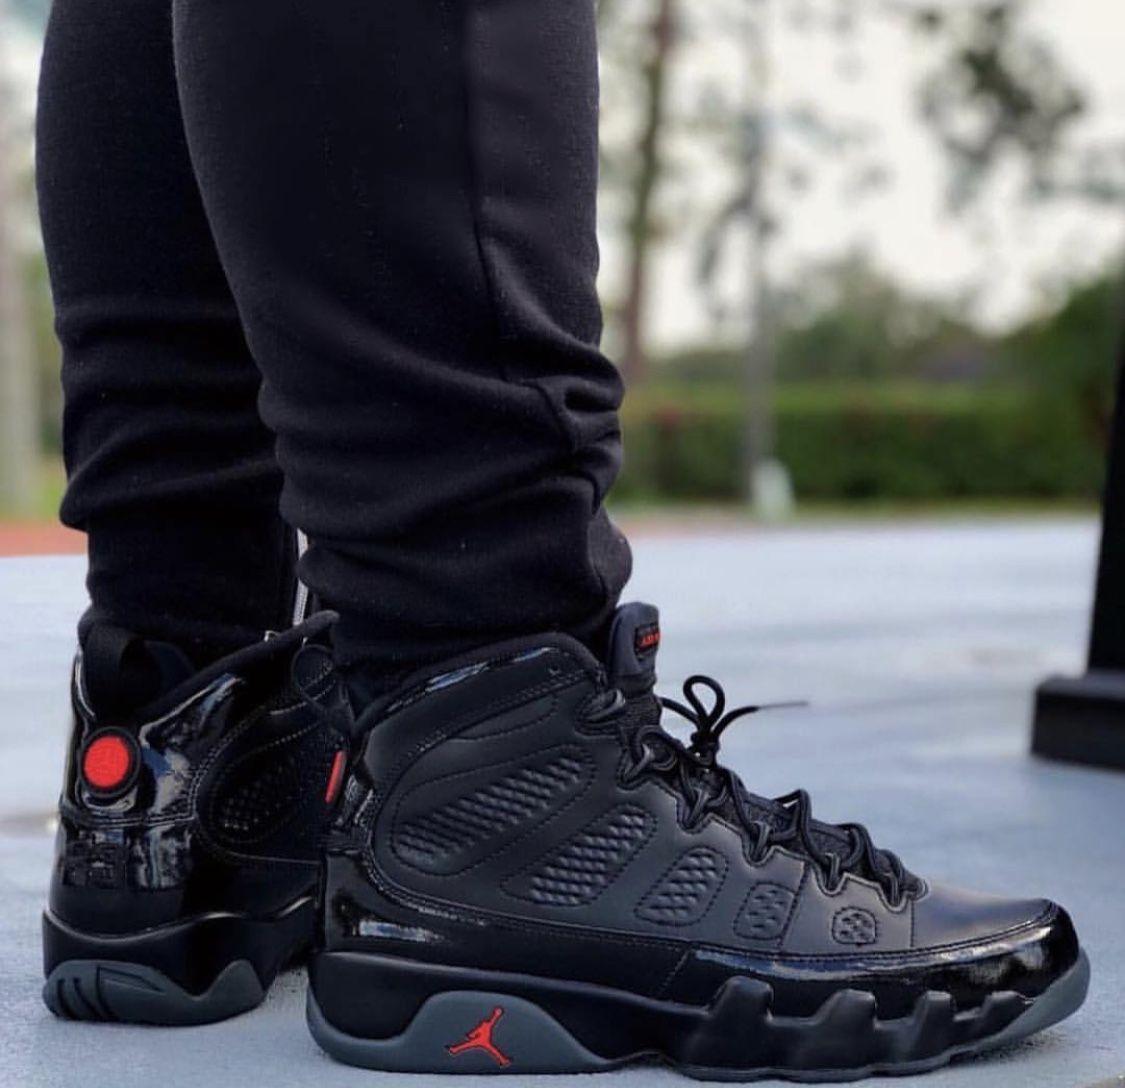 Hype shoes, Sneakers, Air jordans